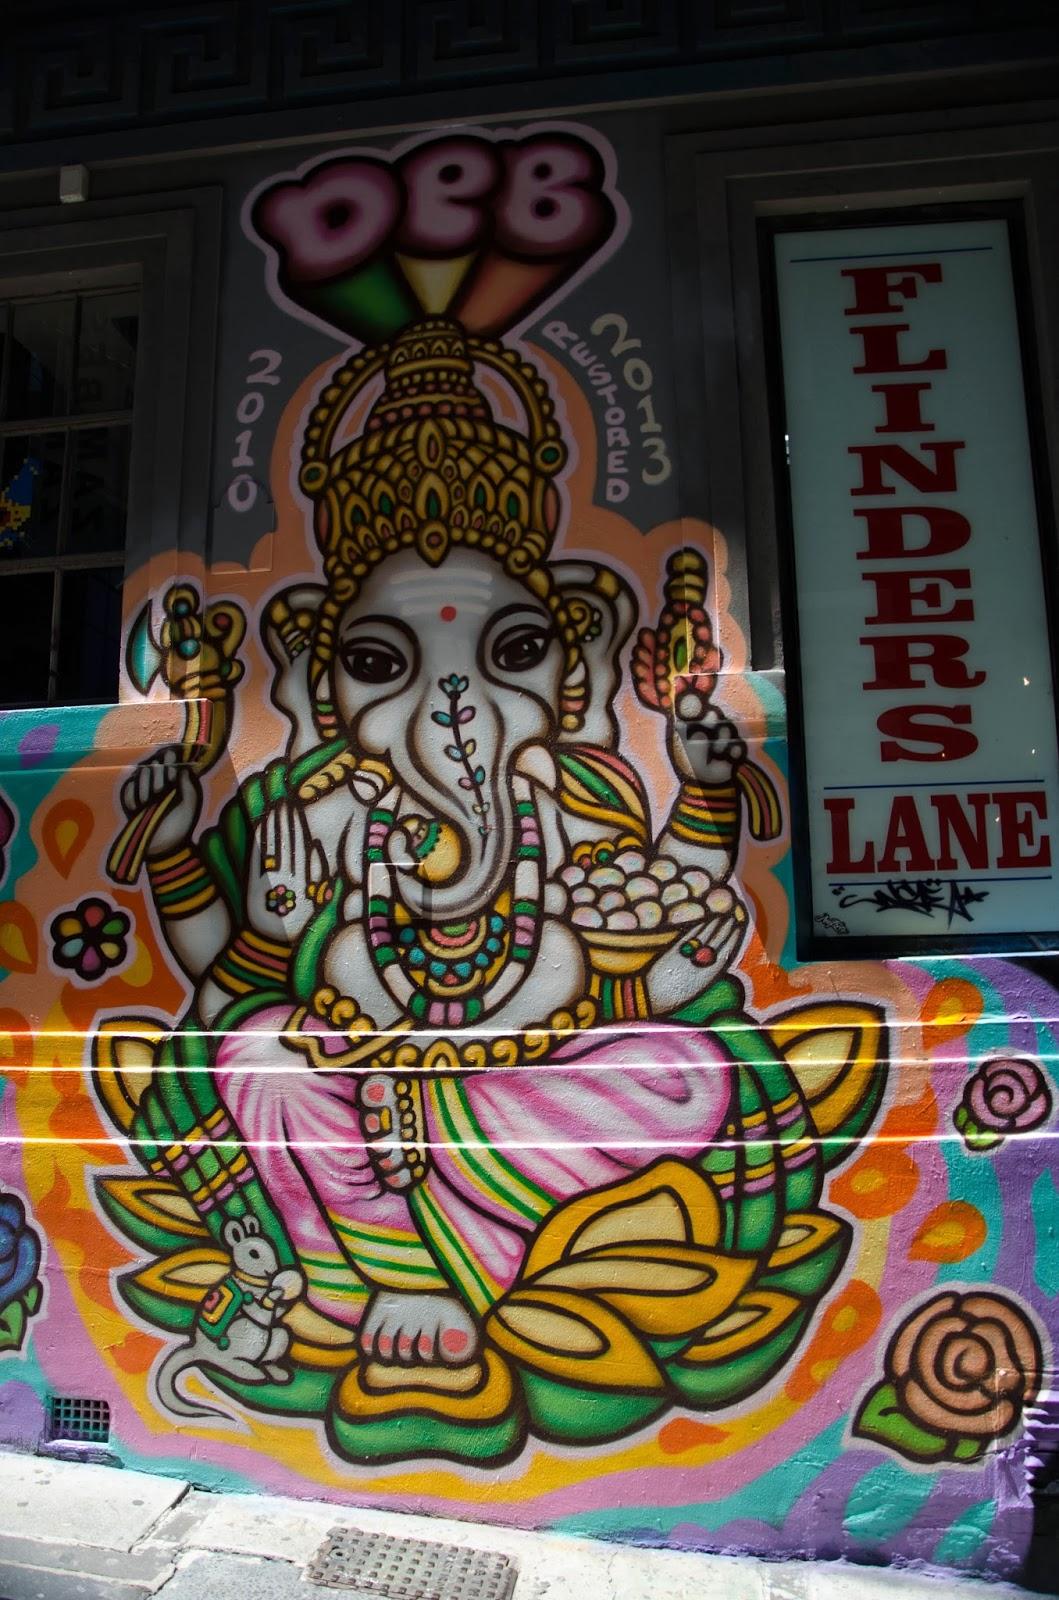 ganesh grafitti in a lane in Melbourne.